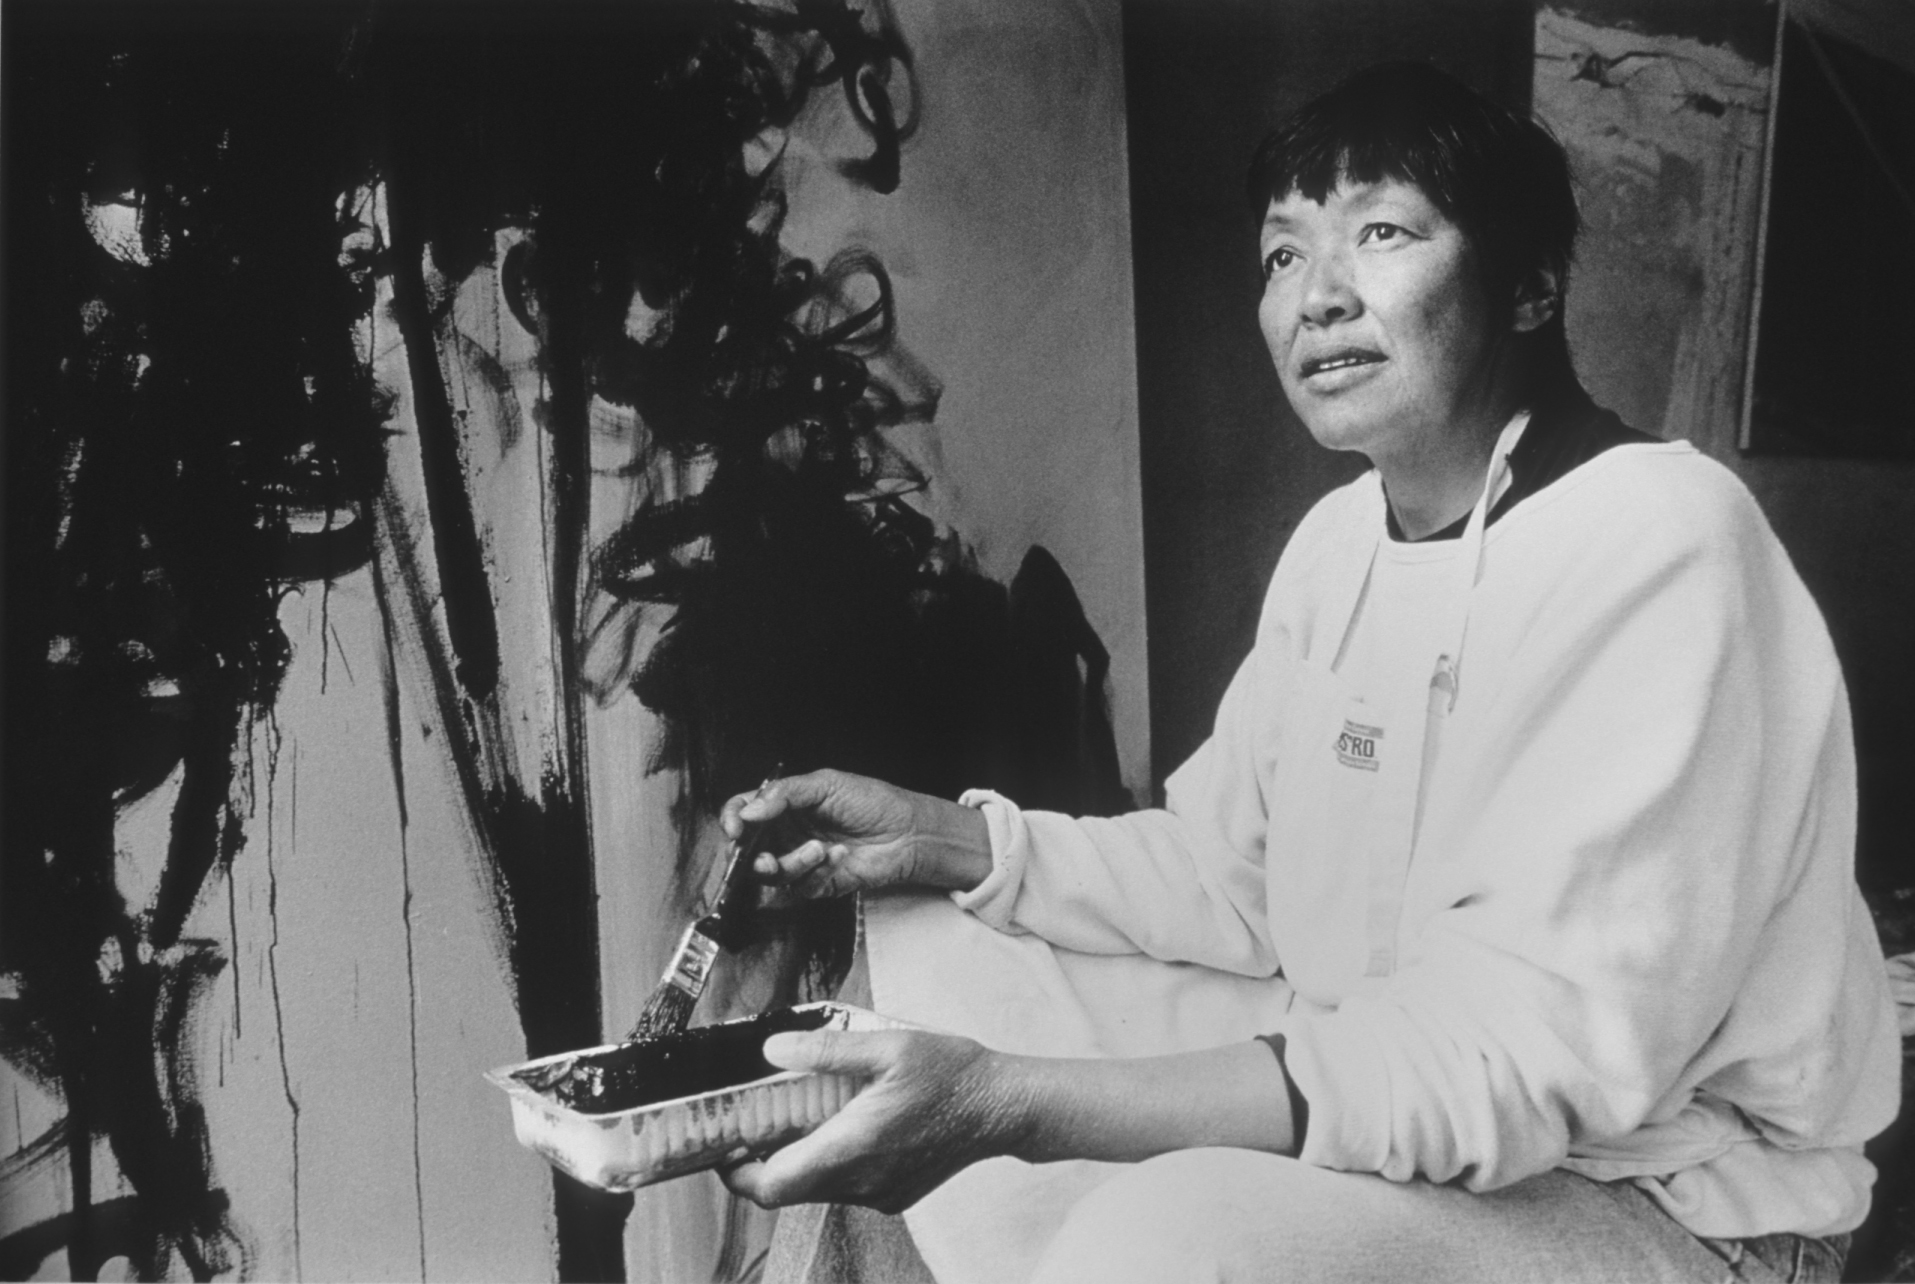 1955_Bernice-Bing-1990-Philo-CA_-courtesy-Bob-Hsiang-Photography.jpg